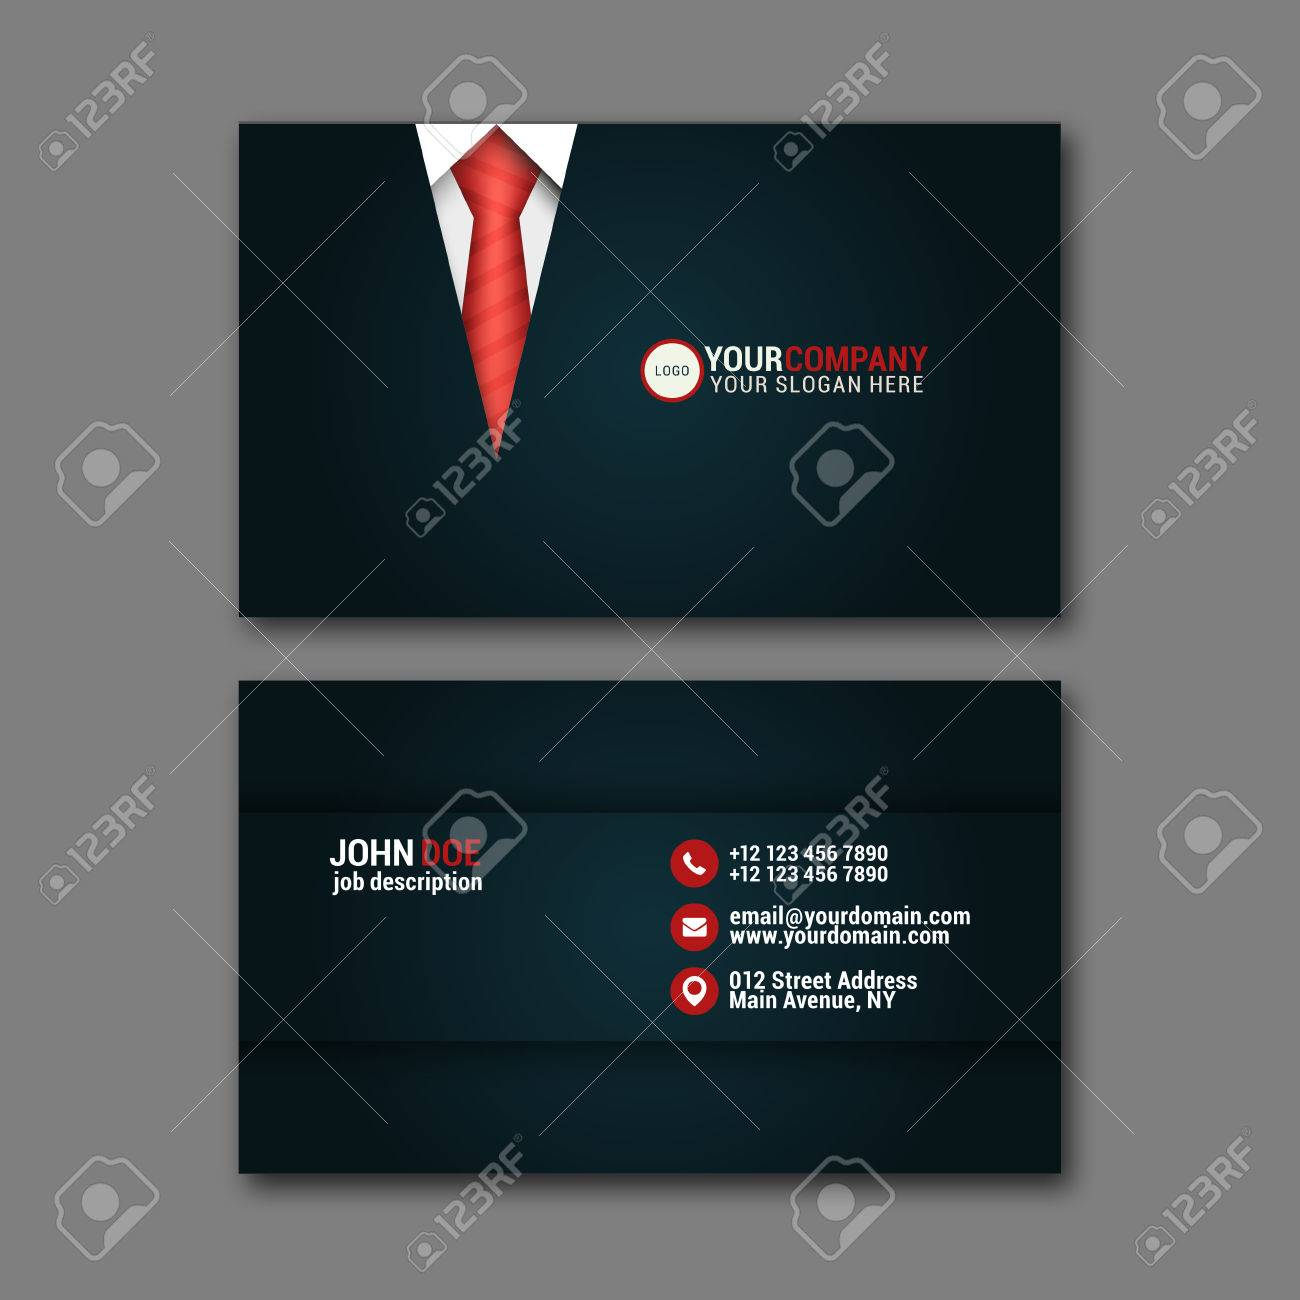 Elegant tailor business card design template royalty free cliparts elegant tailor business card design template stock vector 75191046 reheart Choice Image